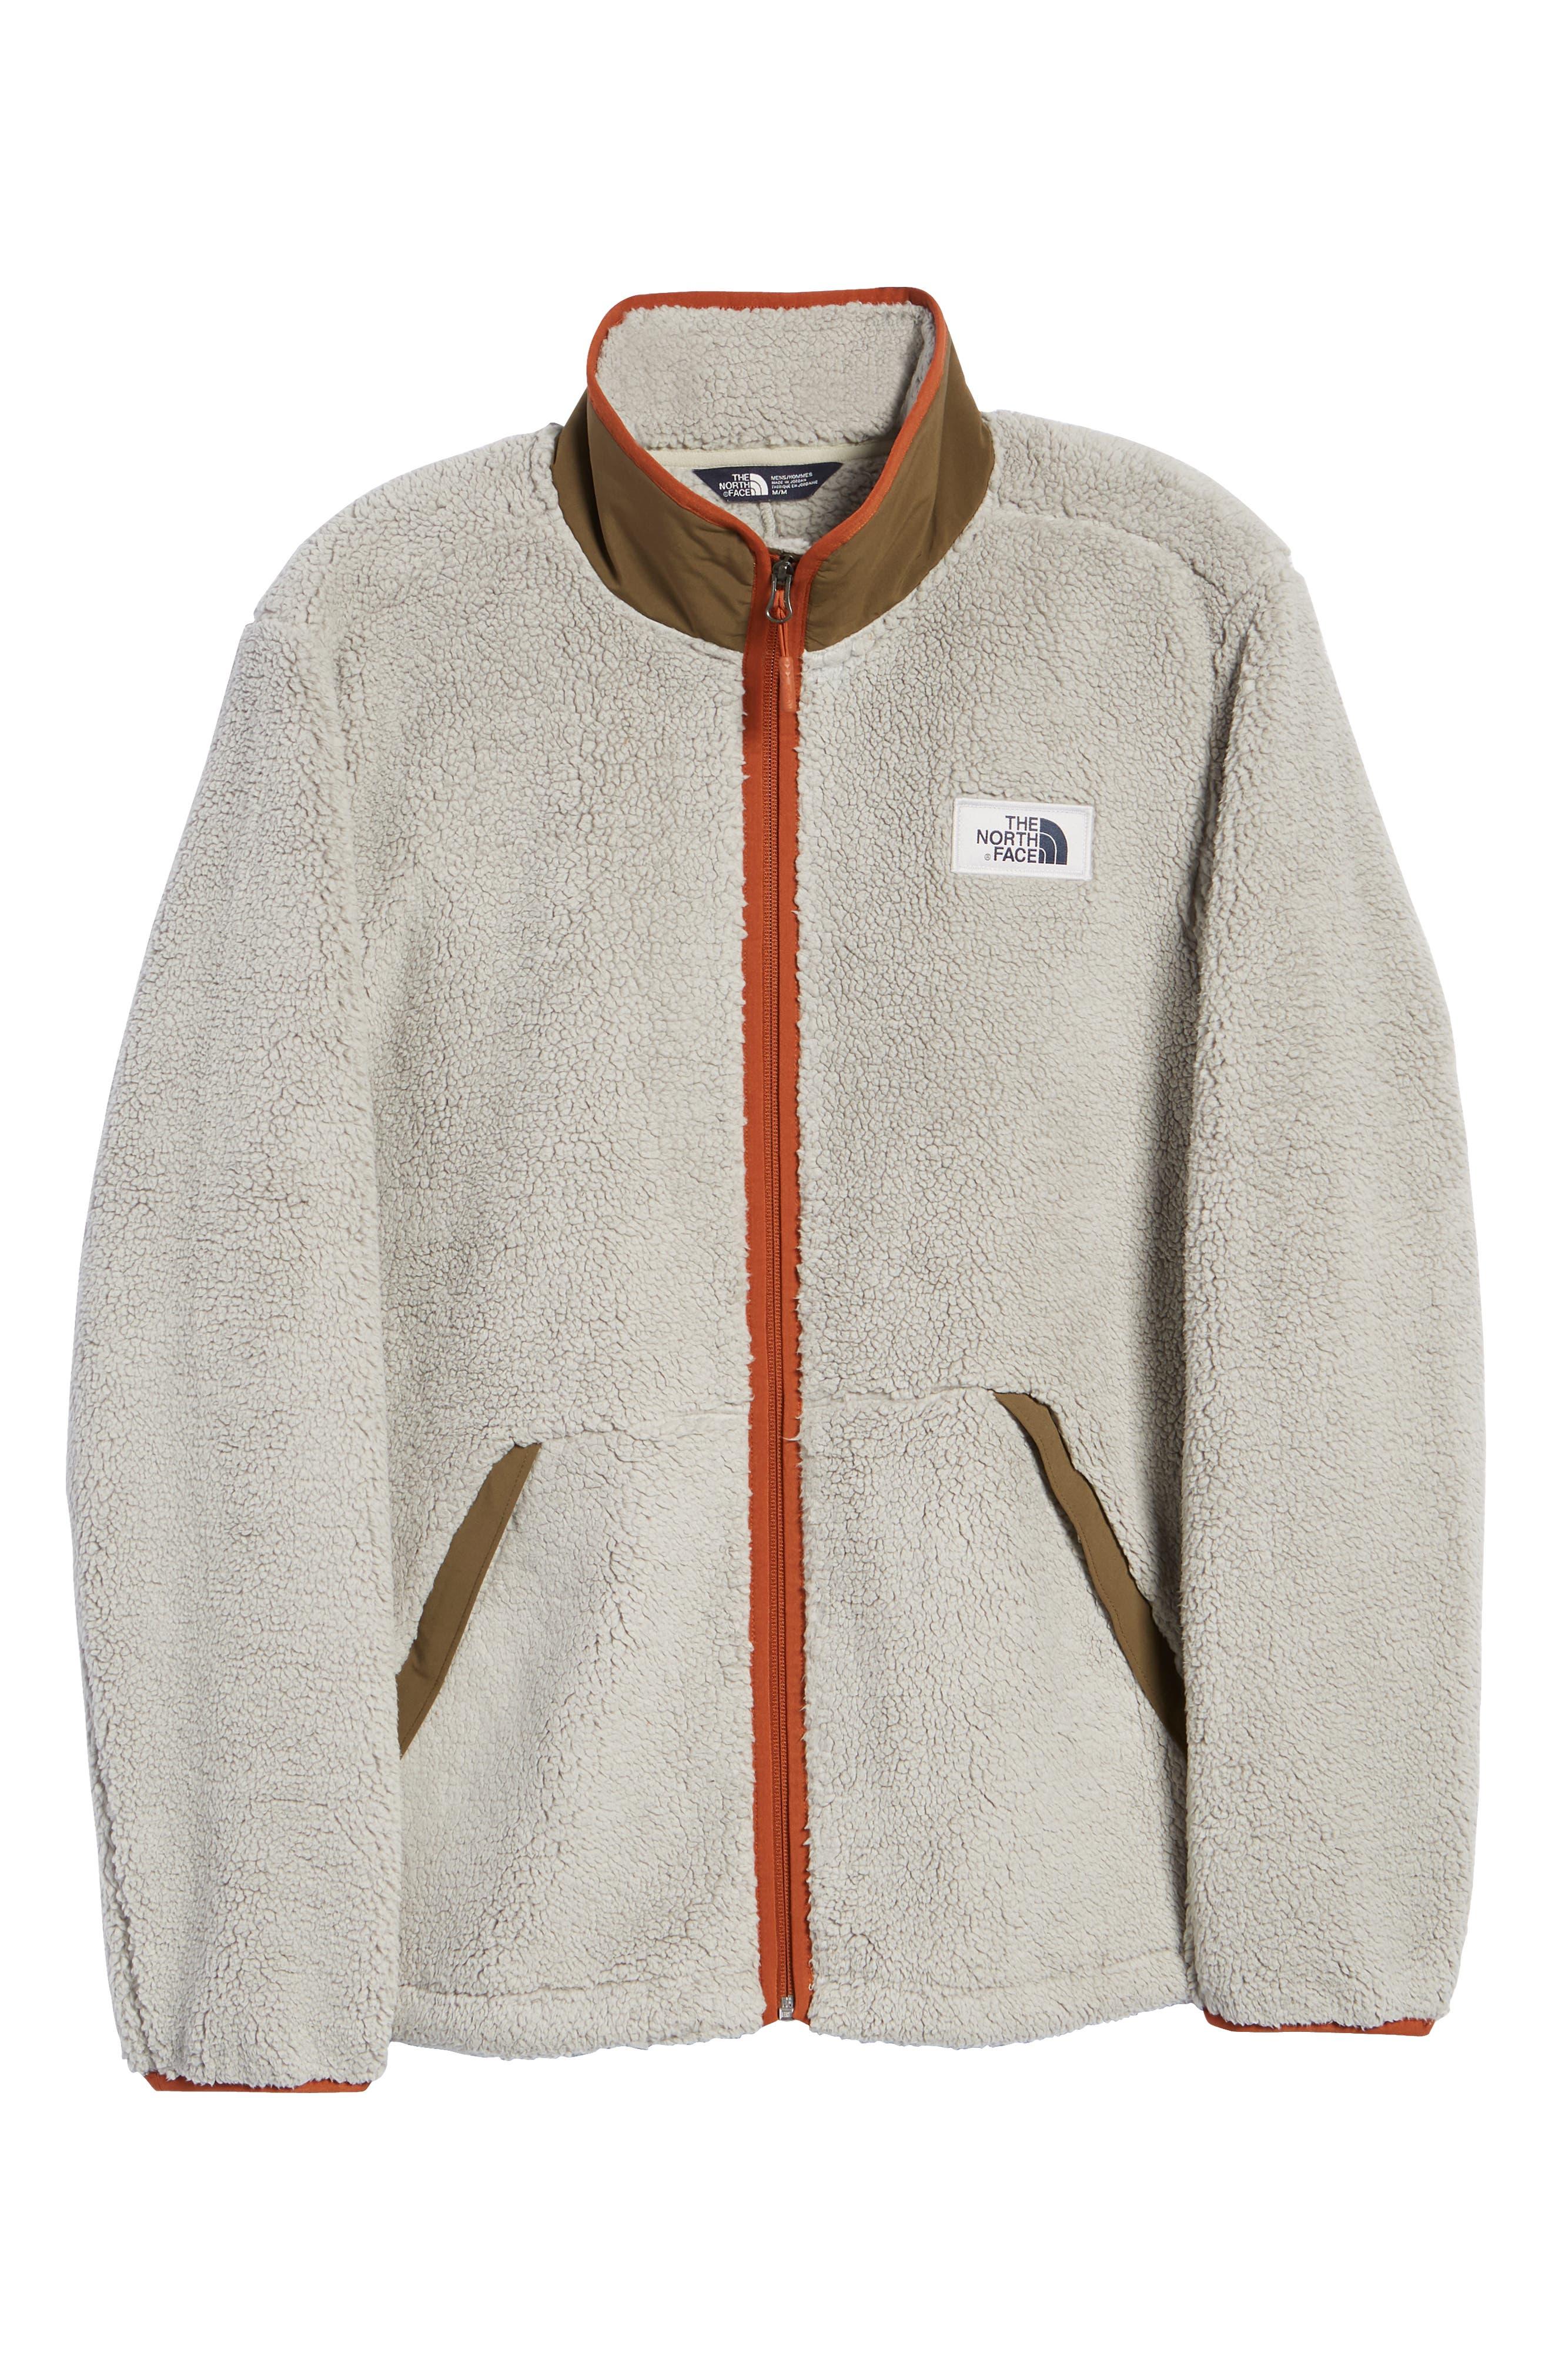 Campshire Zip Fleece Jacket,                             Alternate thumbnail 58, color,